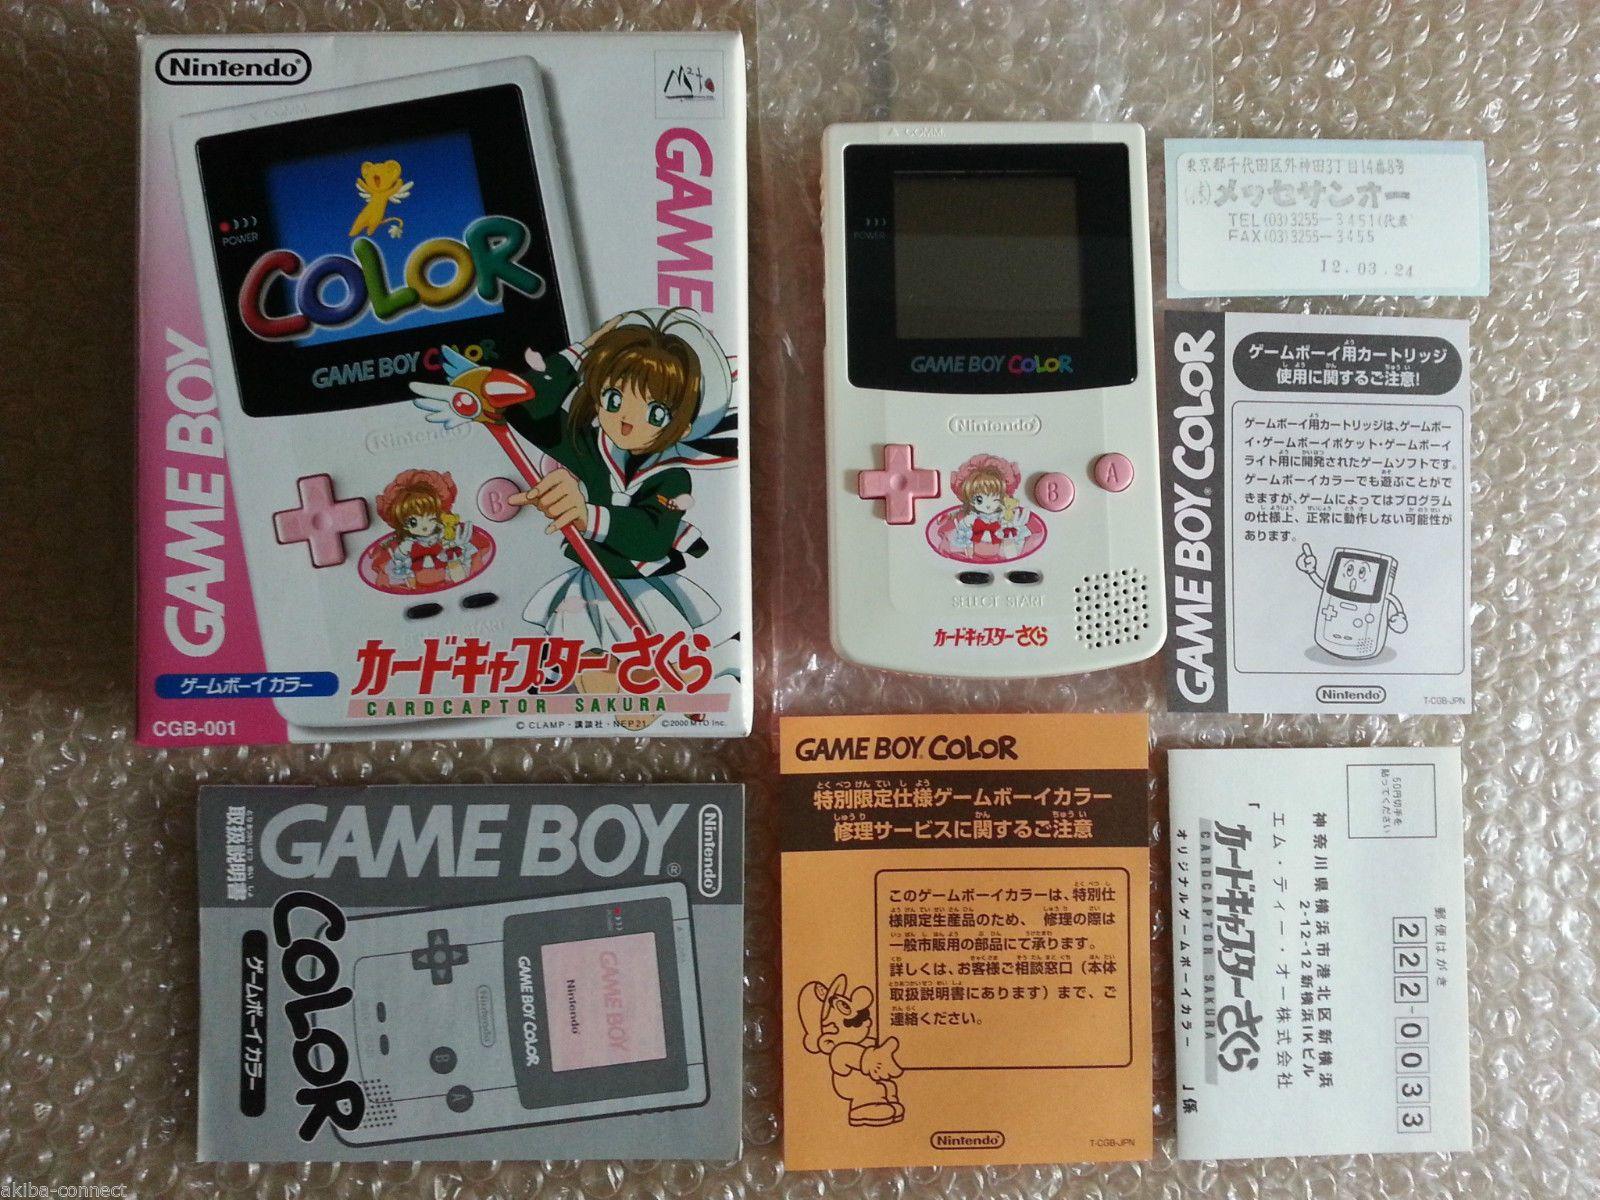 Game boy color japan - Console Nintendo Gameboy Color Cardcaptor Sakura Limited Edition Import Japan